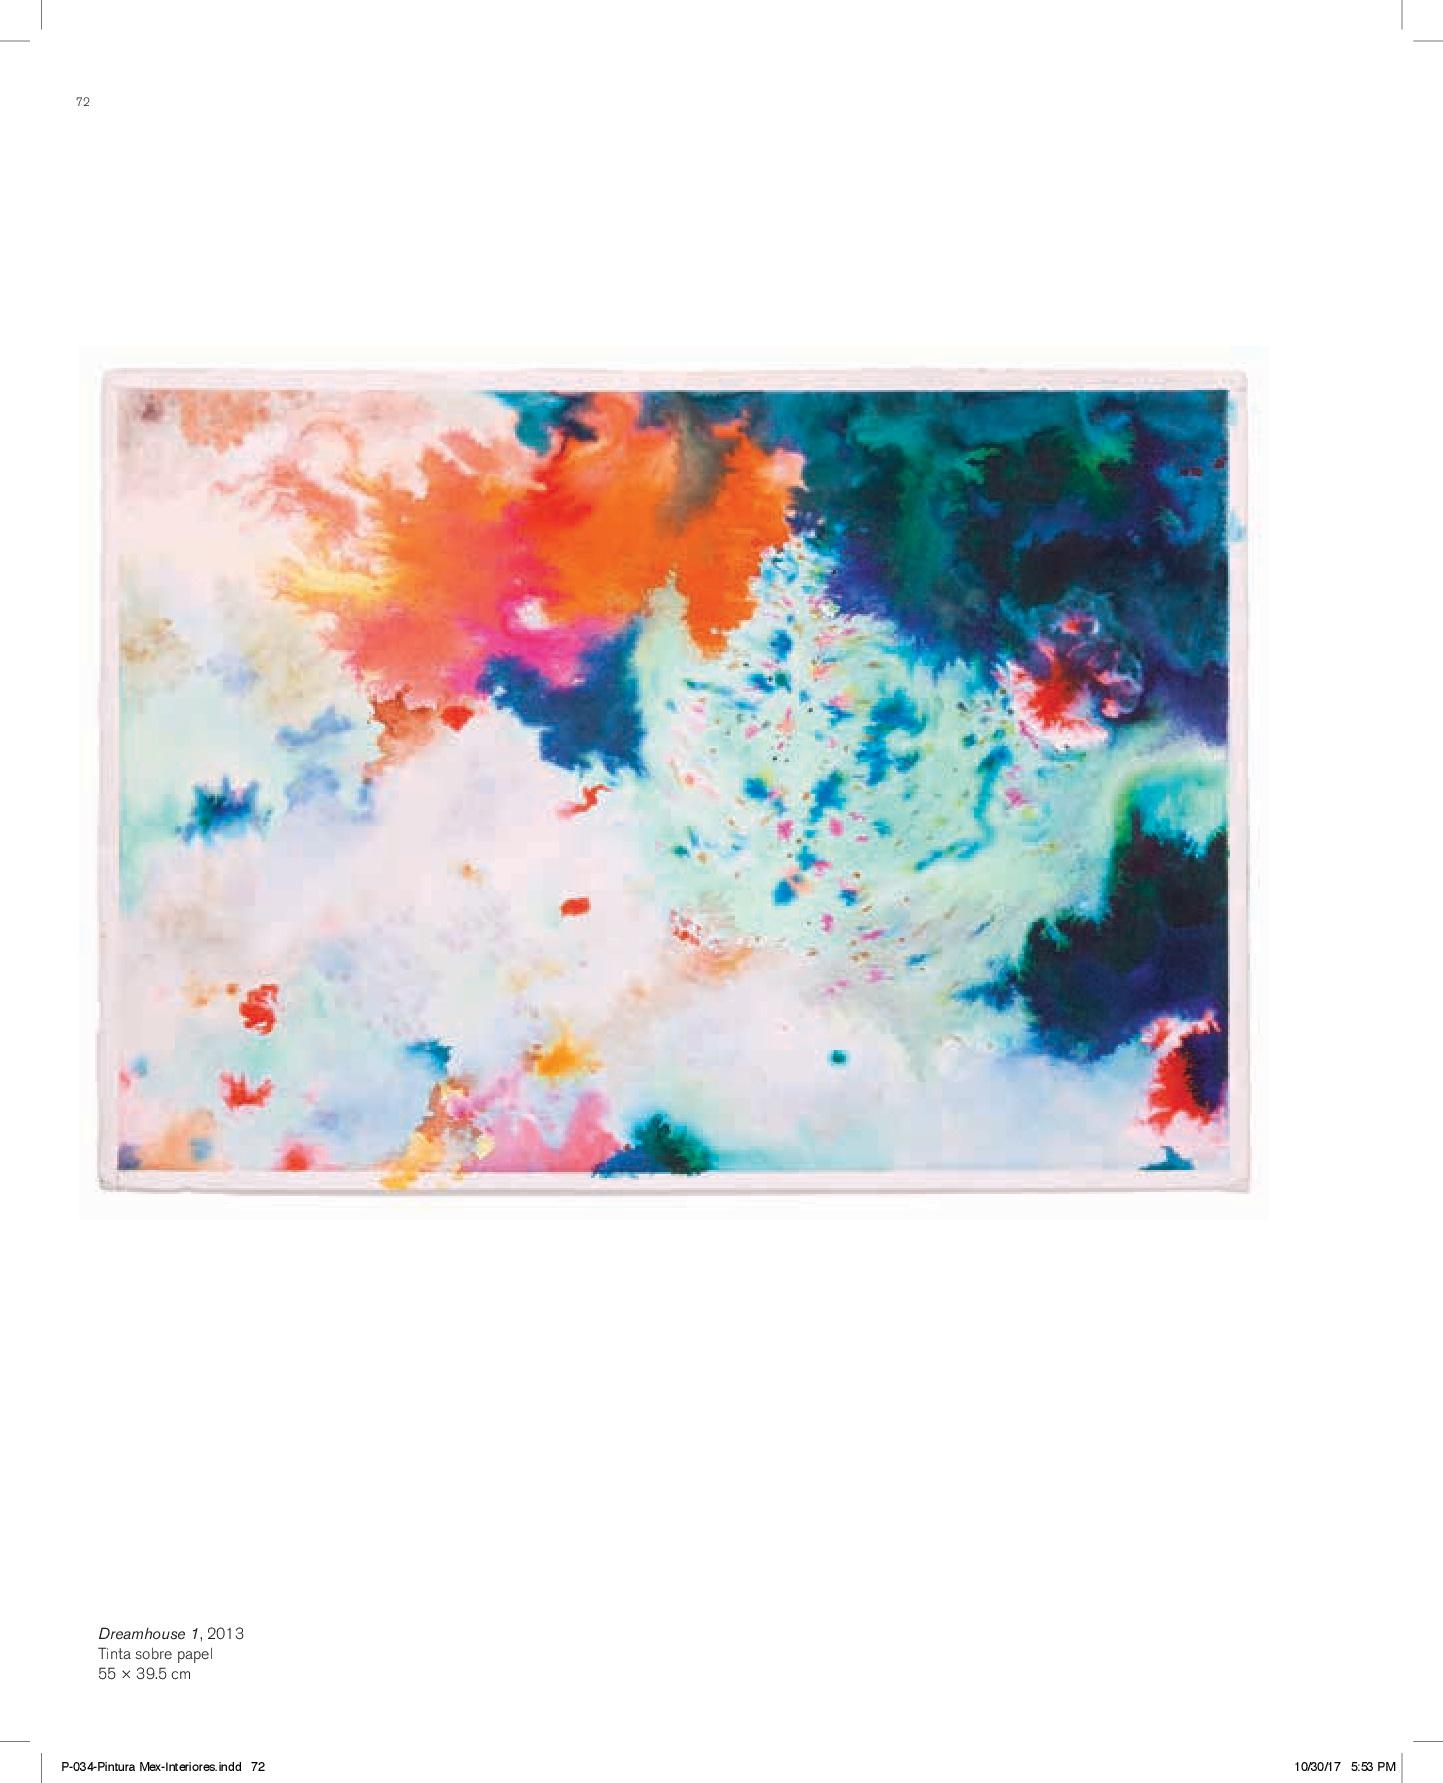 P-034-Pintura-Mex-Interiores-L04-3-072.jpg